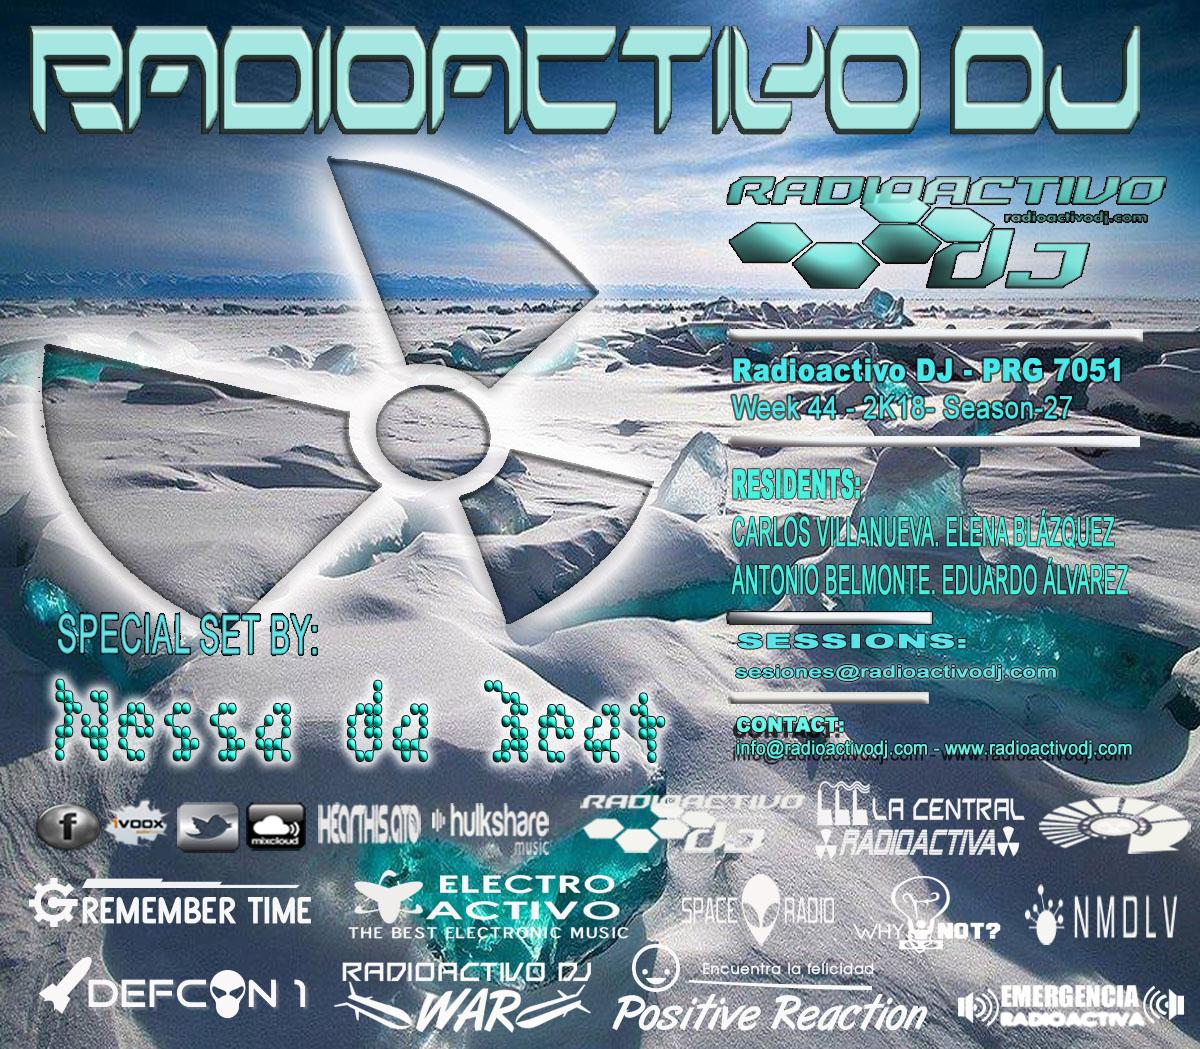 RADIOACTIVO-DJ-44-2018